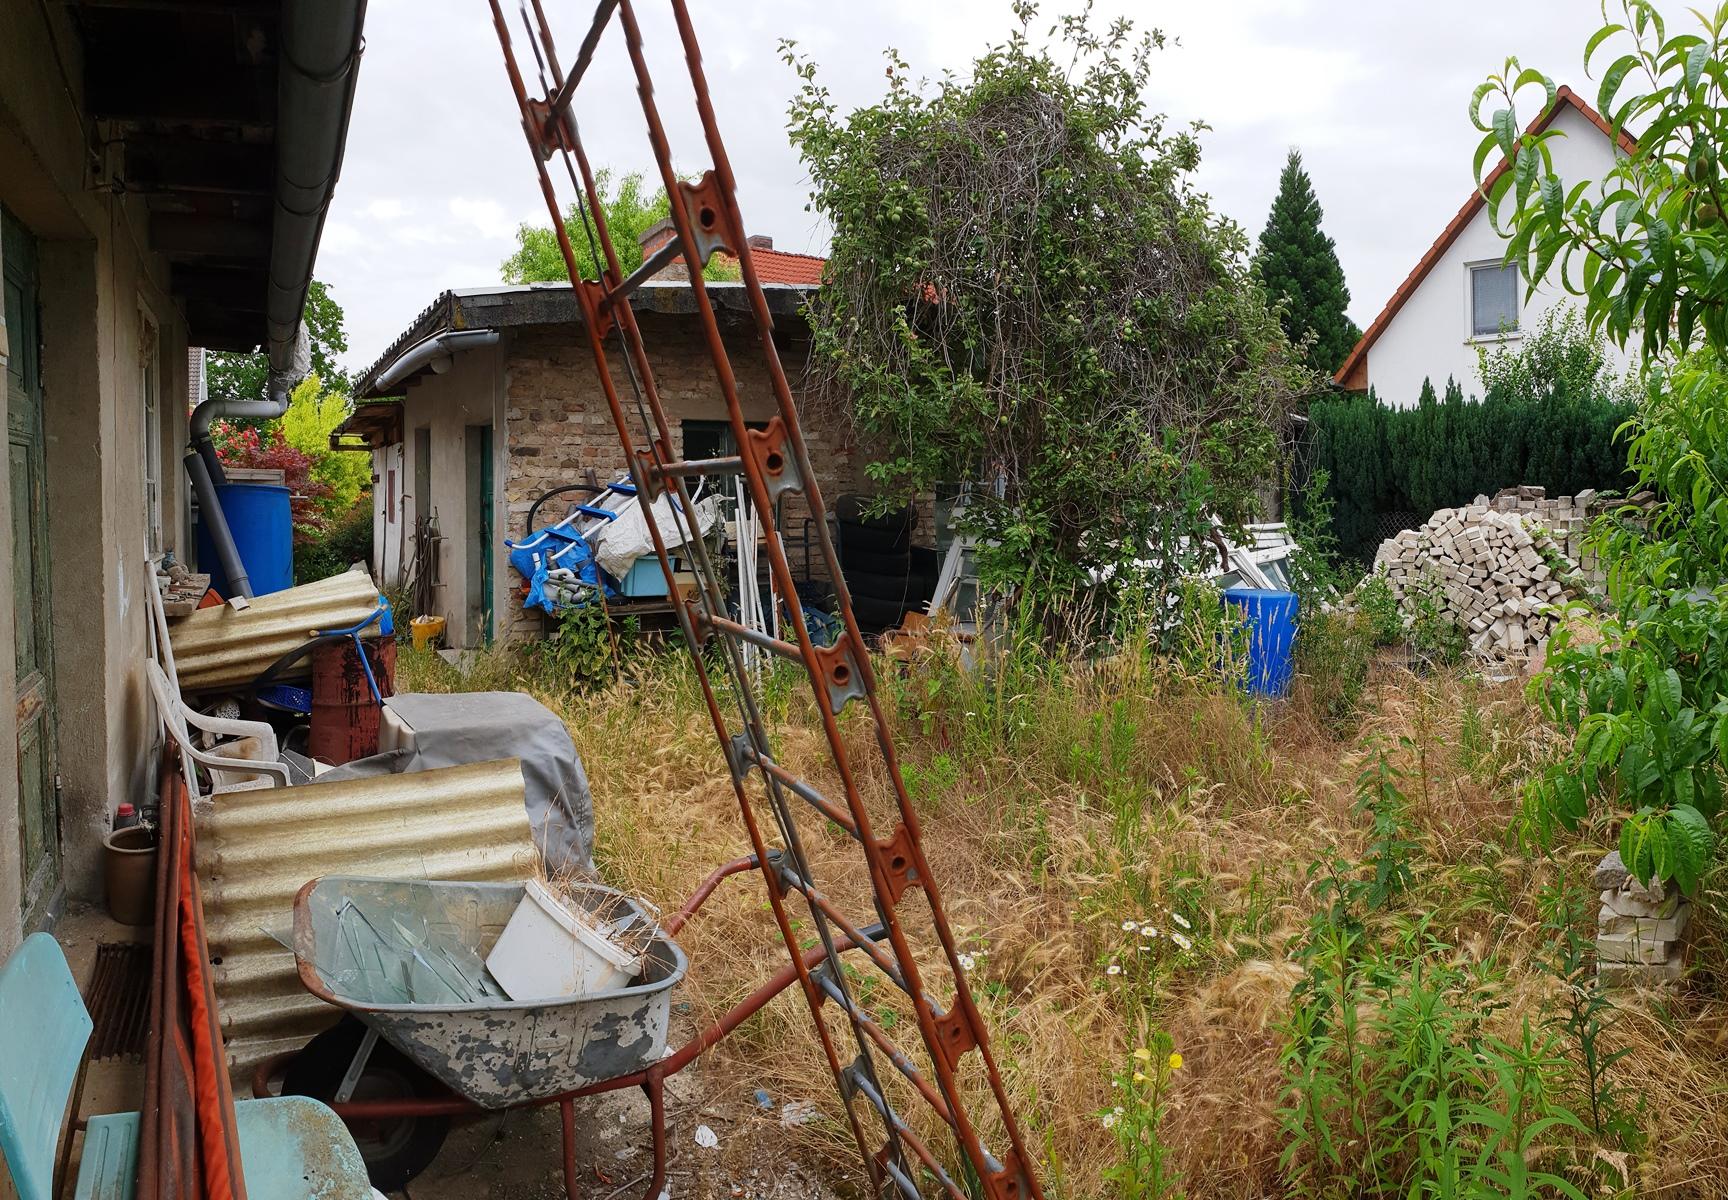 Freifläche hinter dem Haus